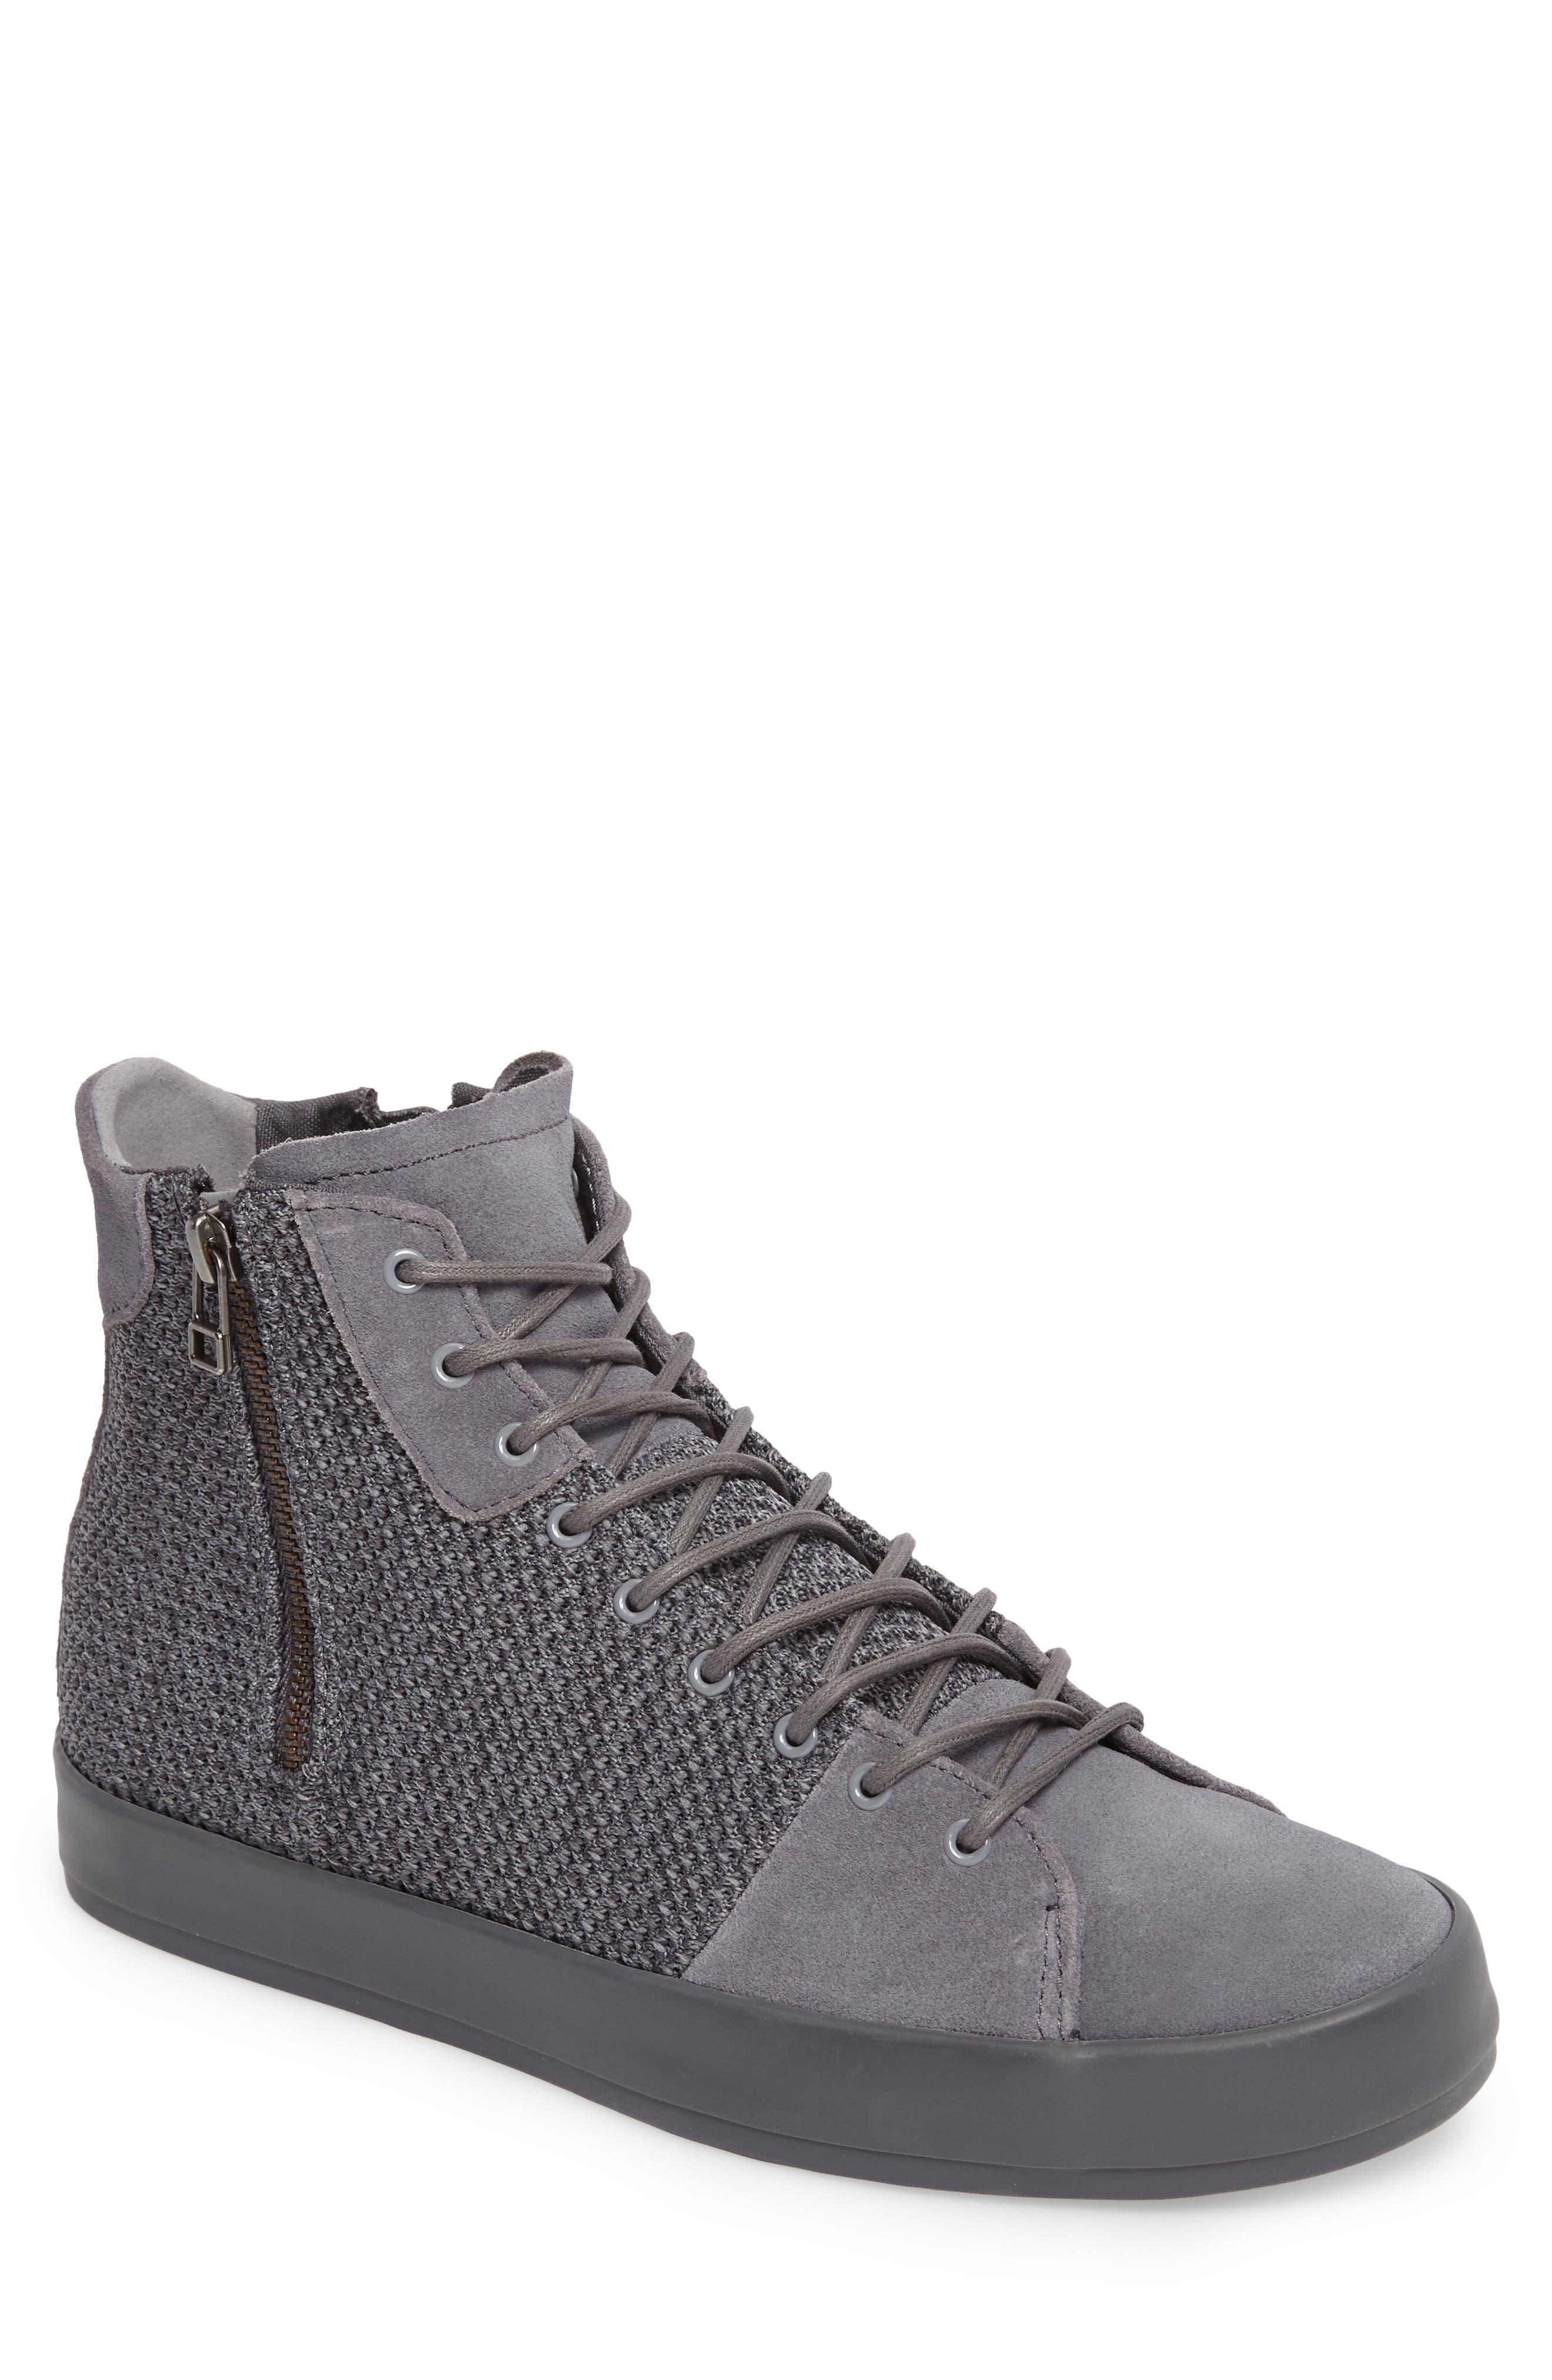 Carda Hi Sneaker,                             Main thumbnail 1, color,                             Smoke Leather